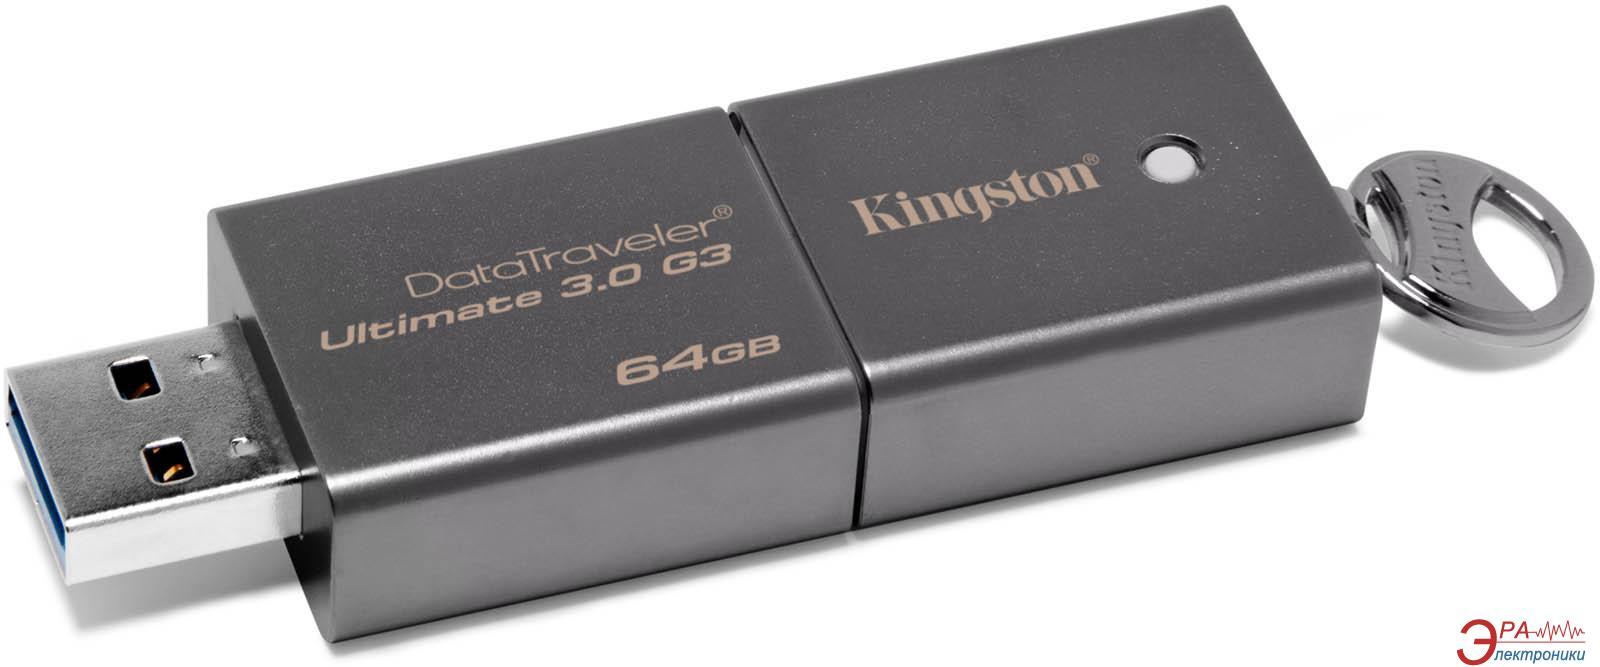 Флеш память USB 3.0 Kingston 64 Гб DataTraveler Ultimate G3 (DTU30G3/64GB)